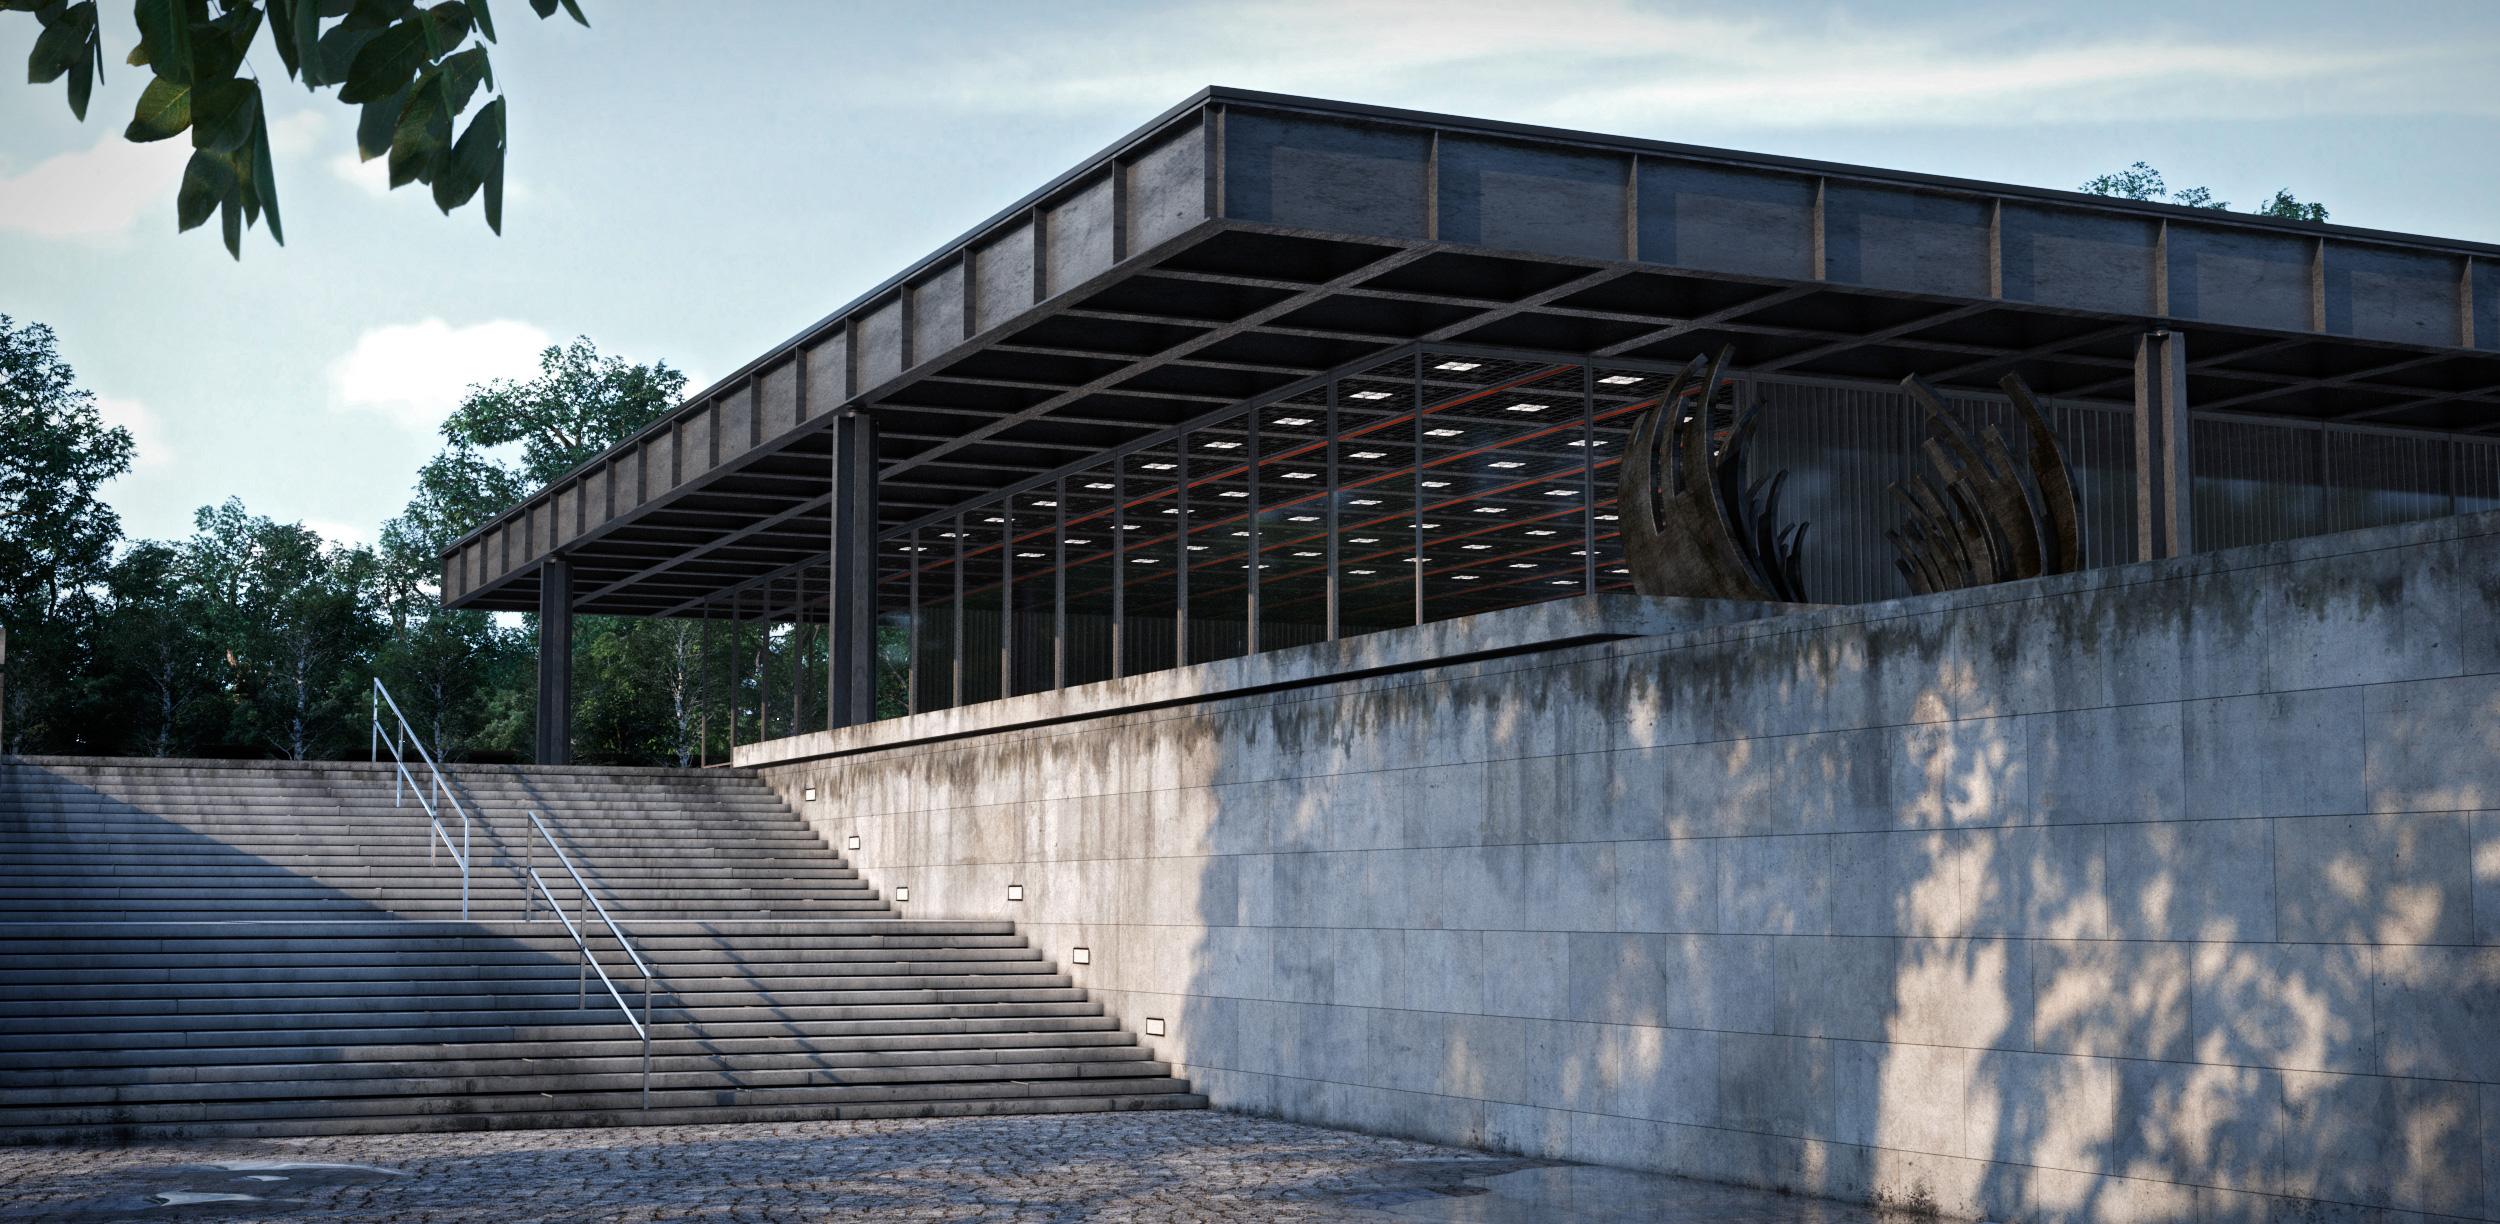 arquitectura-muvhaus-3dvisualization